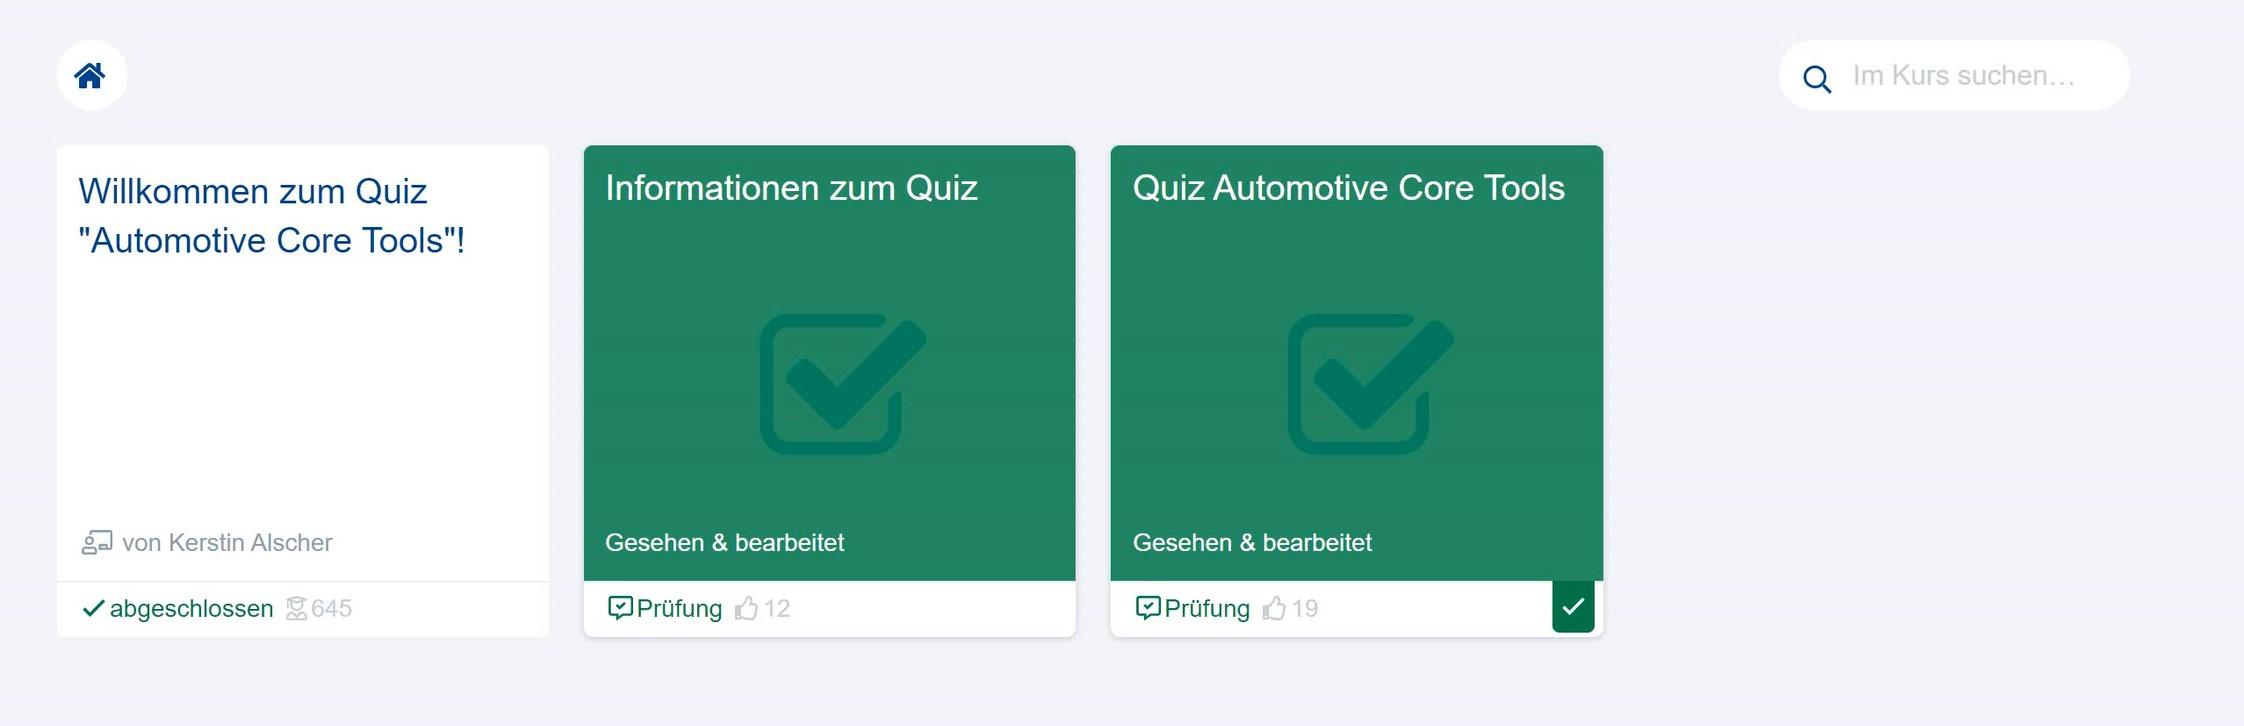 Automotive_Core-Tools_Quiz_Überblick_Screen